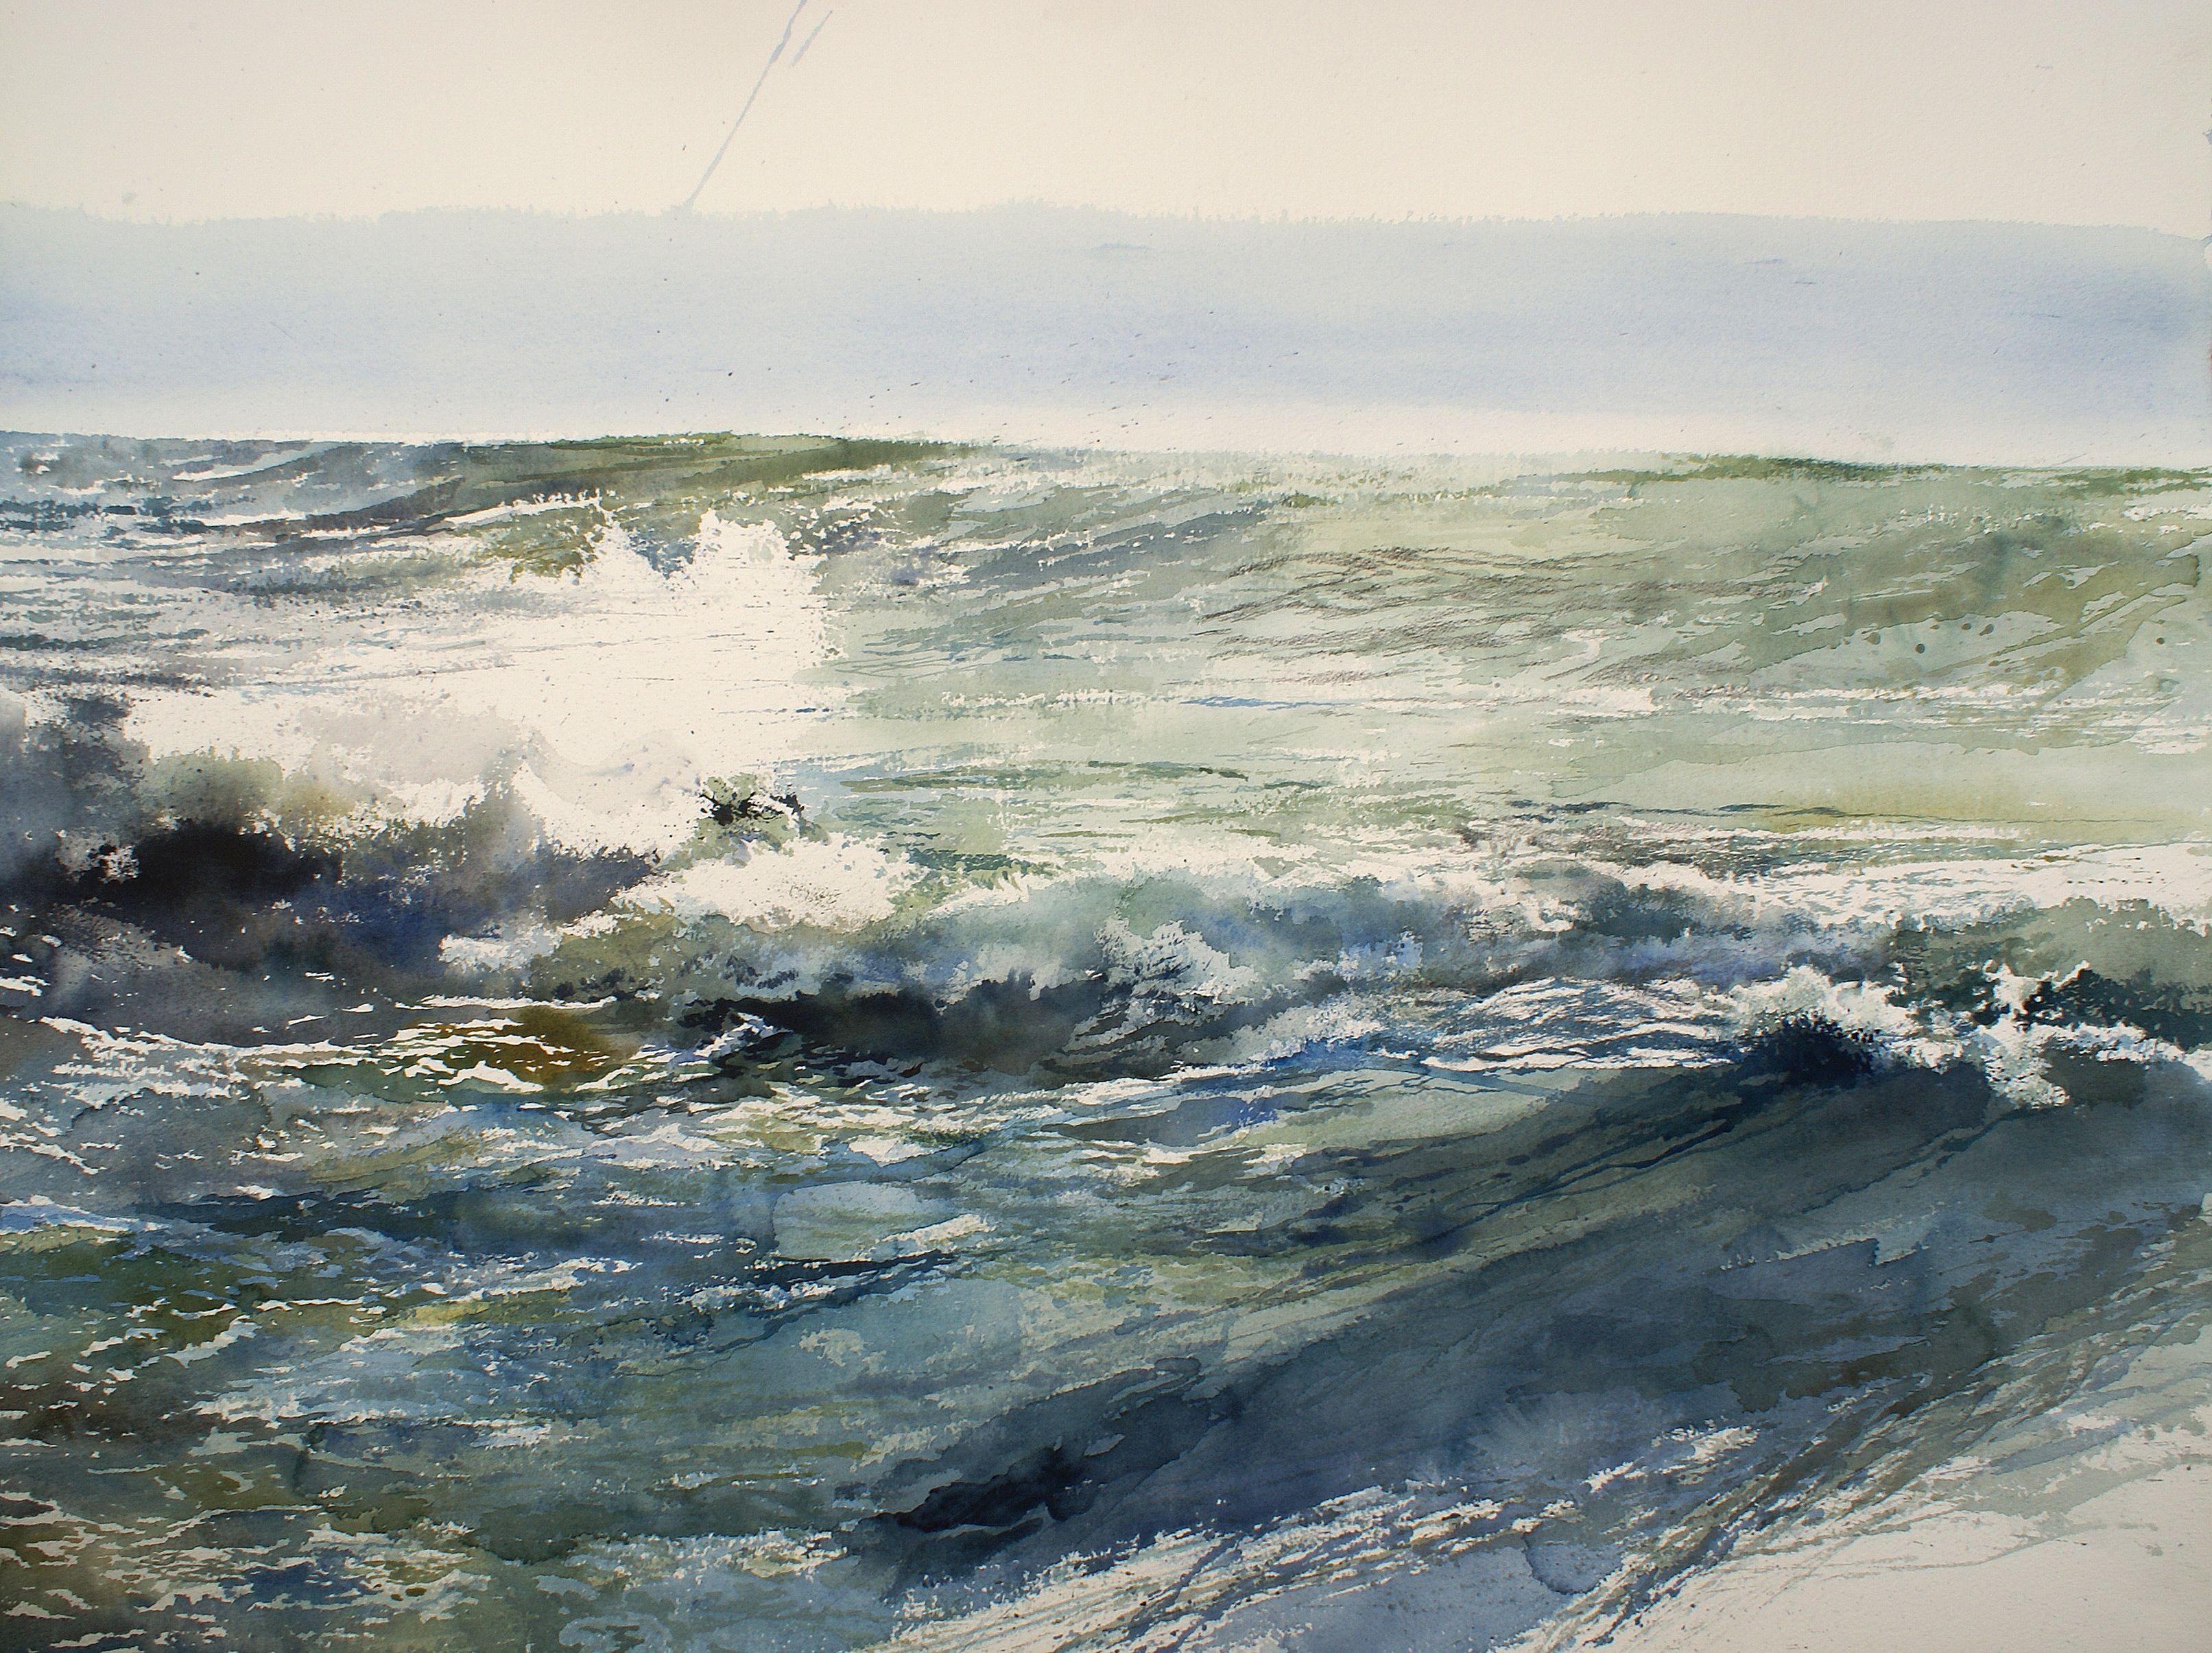 woelige noordzee mer du nord houleuse paintings other seascapes pinterest sea waves. Black Bedroom Furniture Sets. Home Design Ideas